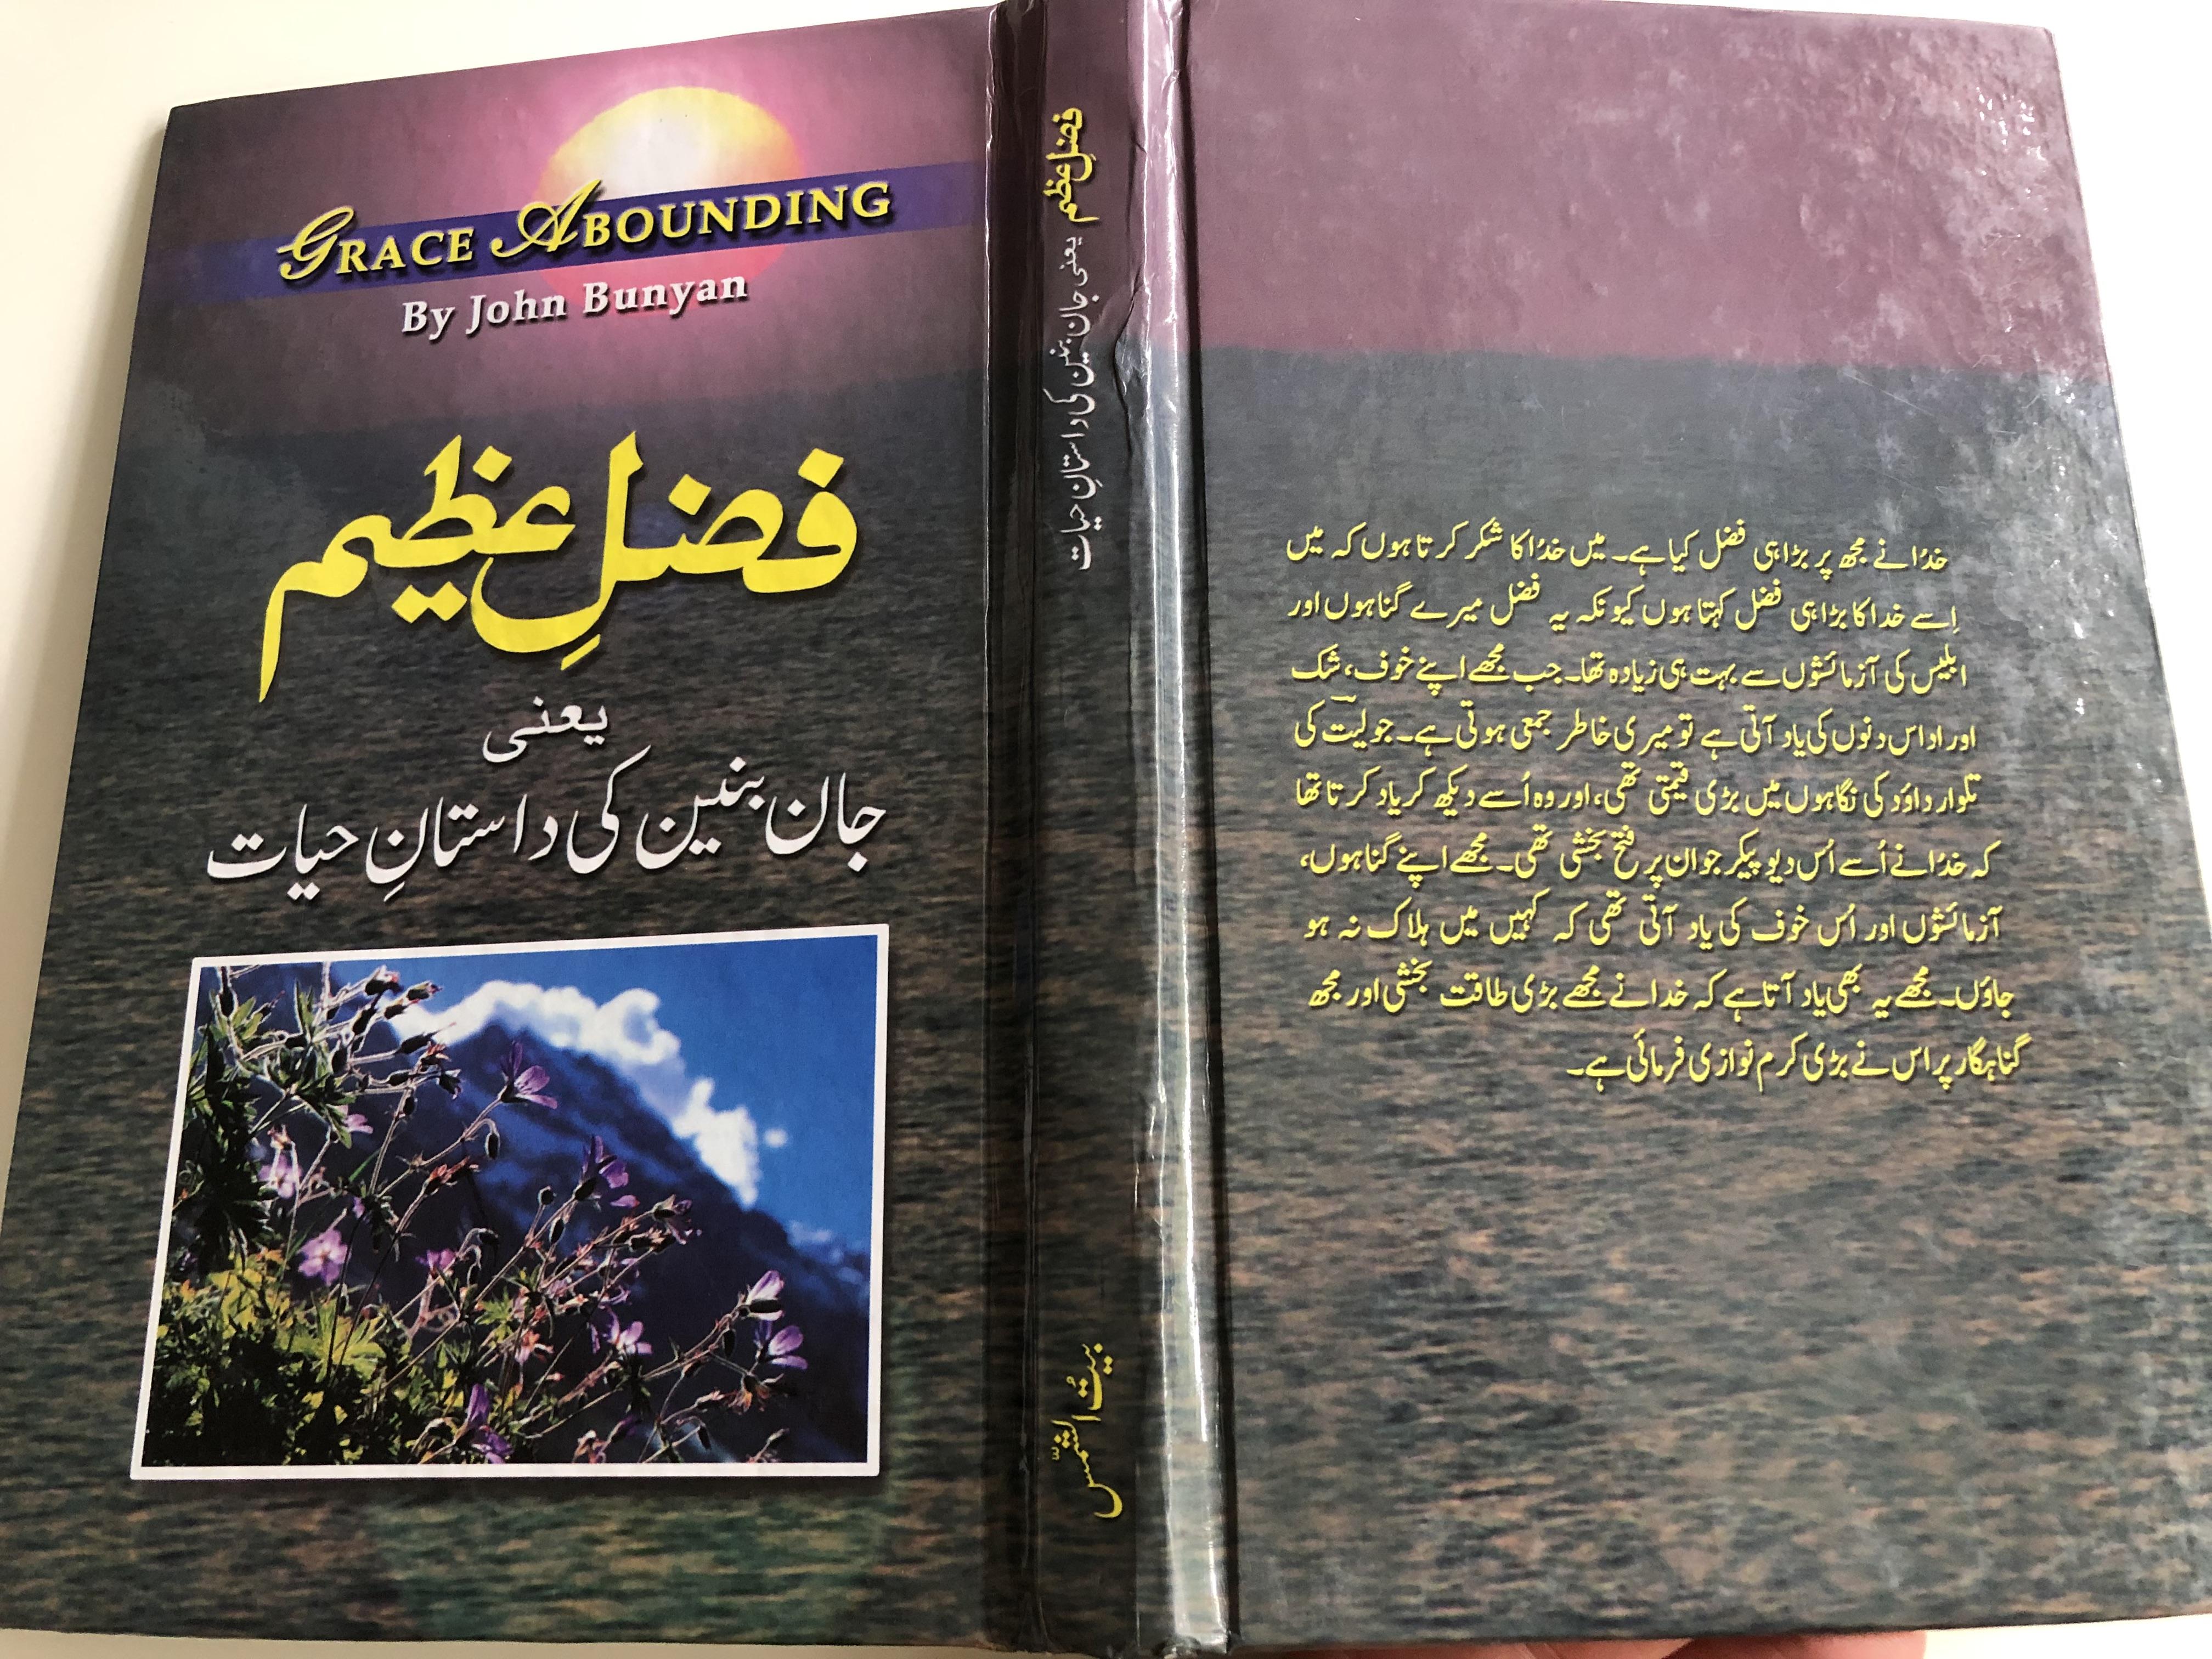 grace-abounding-by-john-bunyan-in-urdu-language-hardcover-grace-abounding-to-the-chief-of-sinners-spiritual-autobiography-of-bunyan-11-.jpg